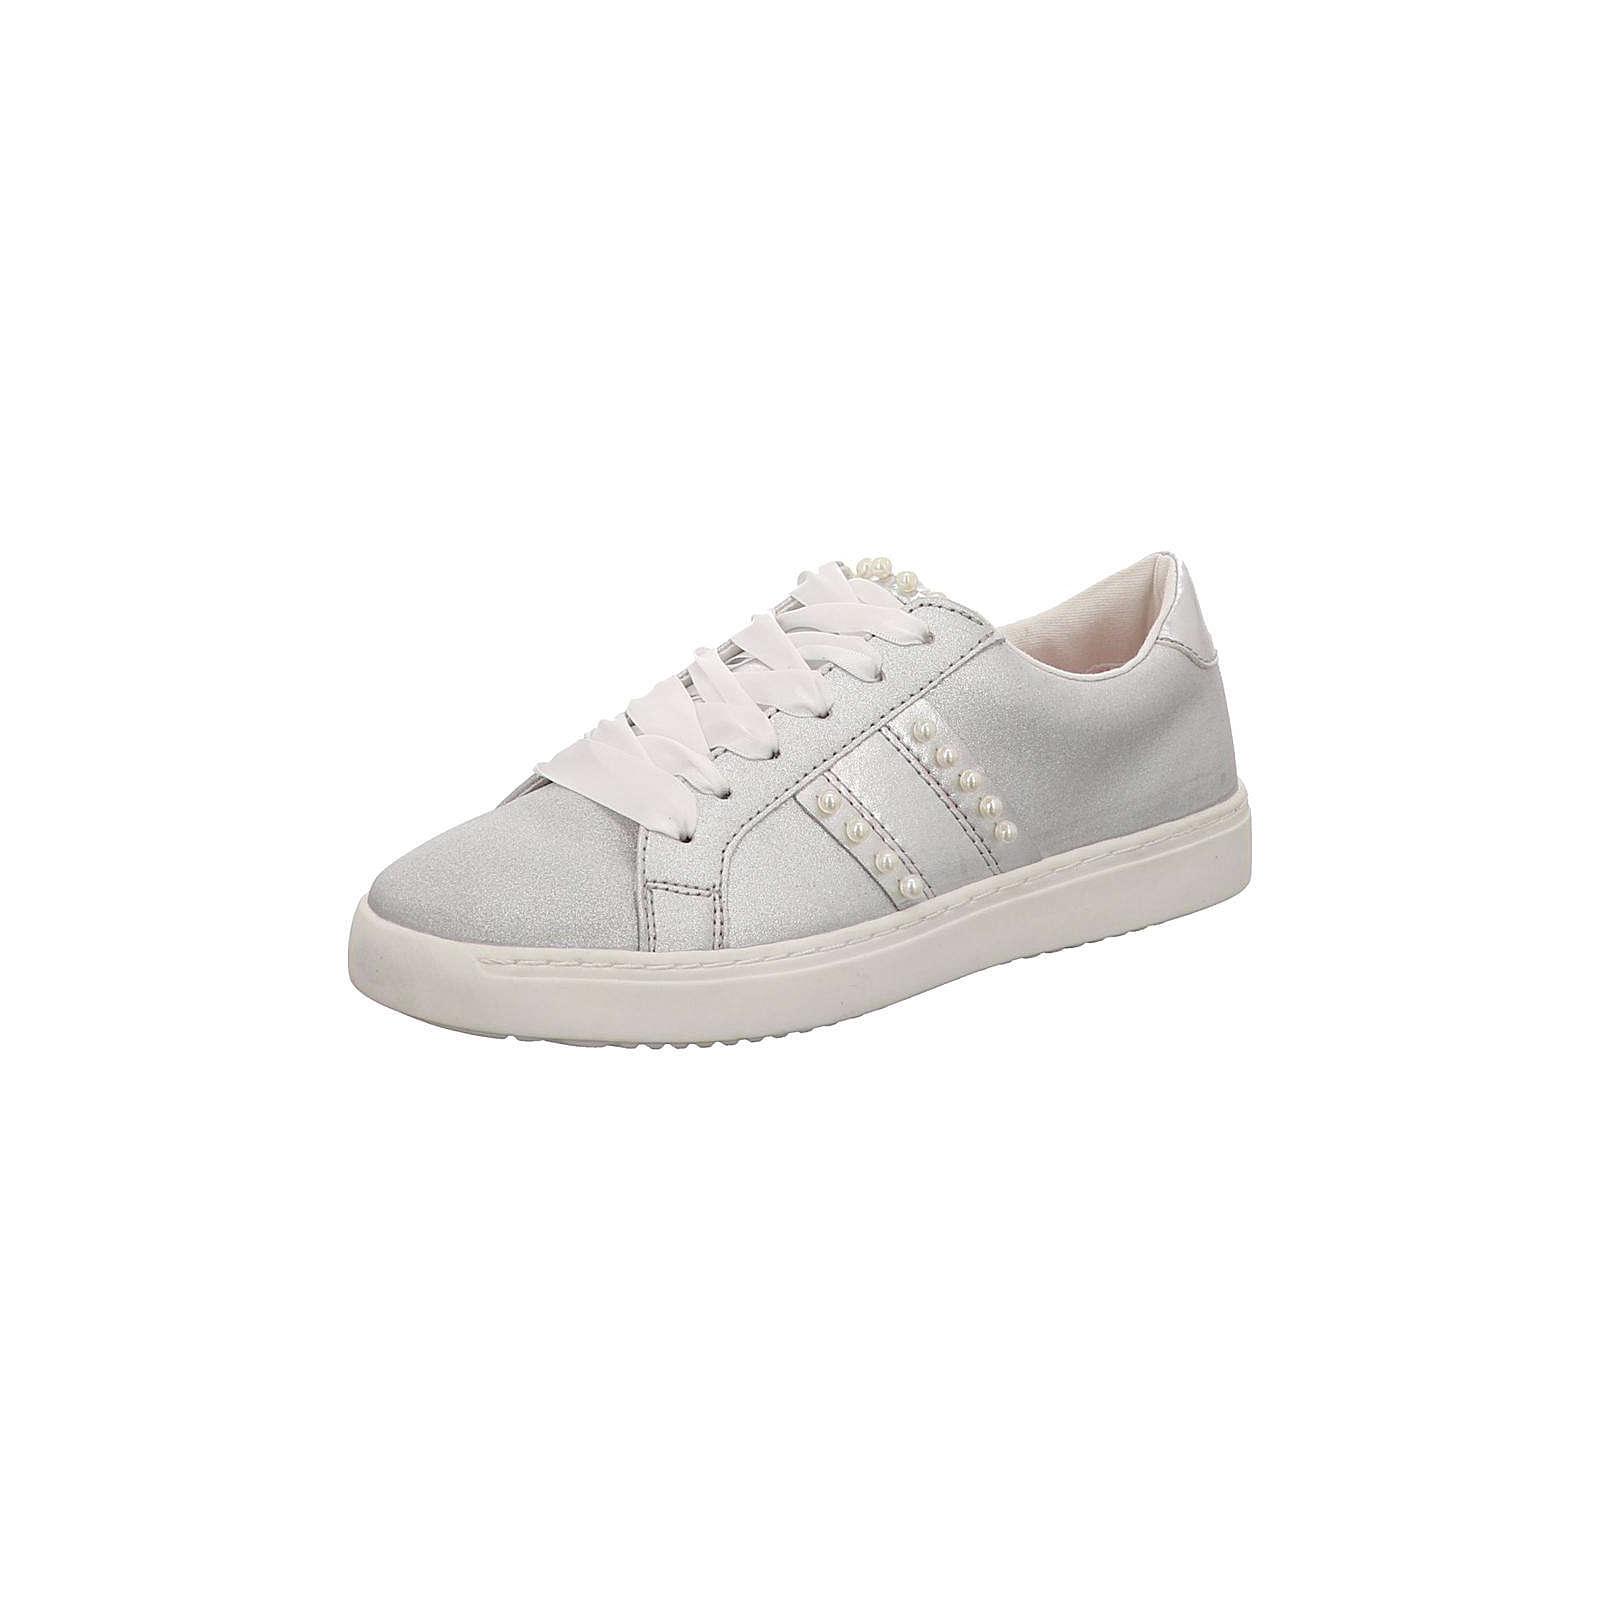 TOM TAILOR Sneakers Low hellgrau Damen Gr. 36